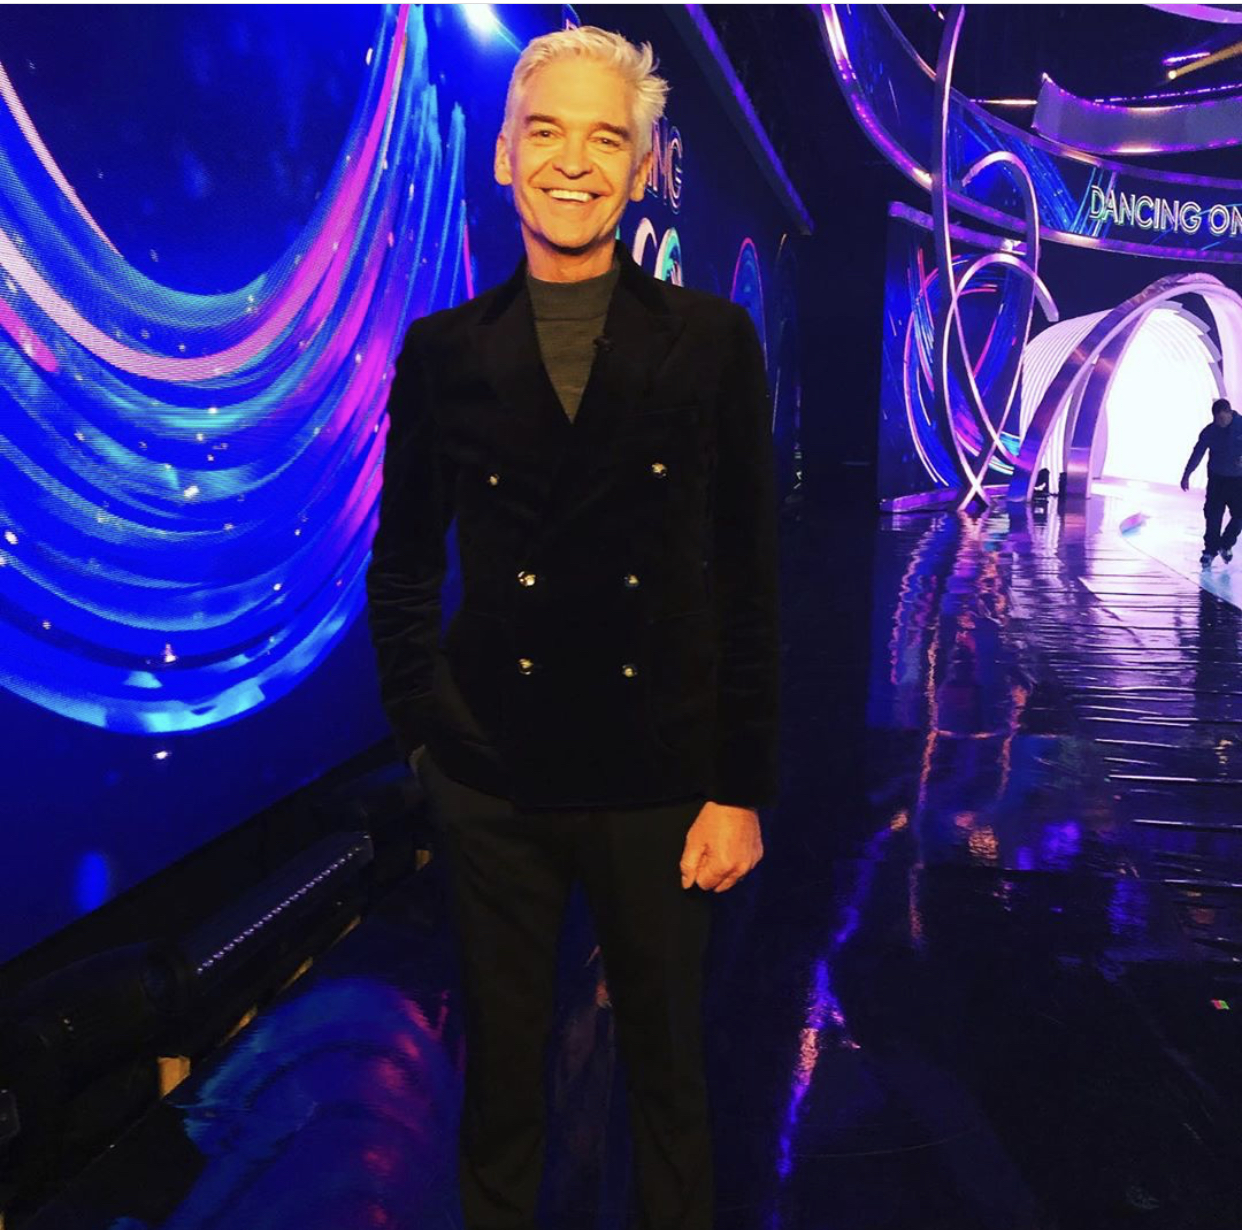 U.K TV presenter, Phillip Schofield